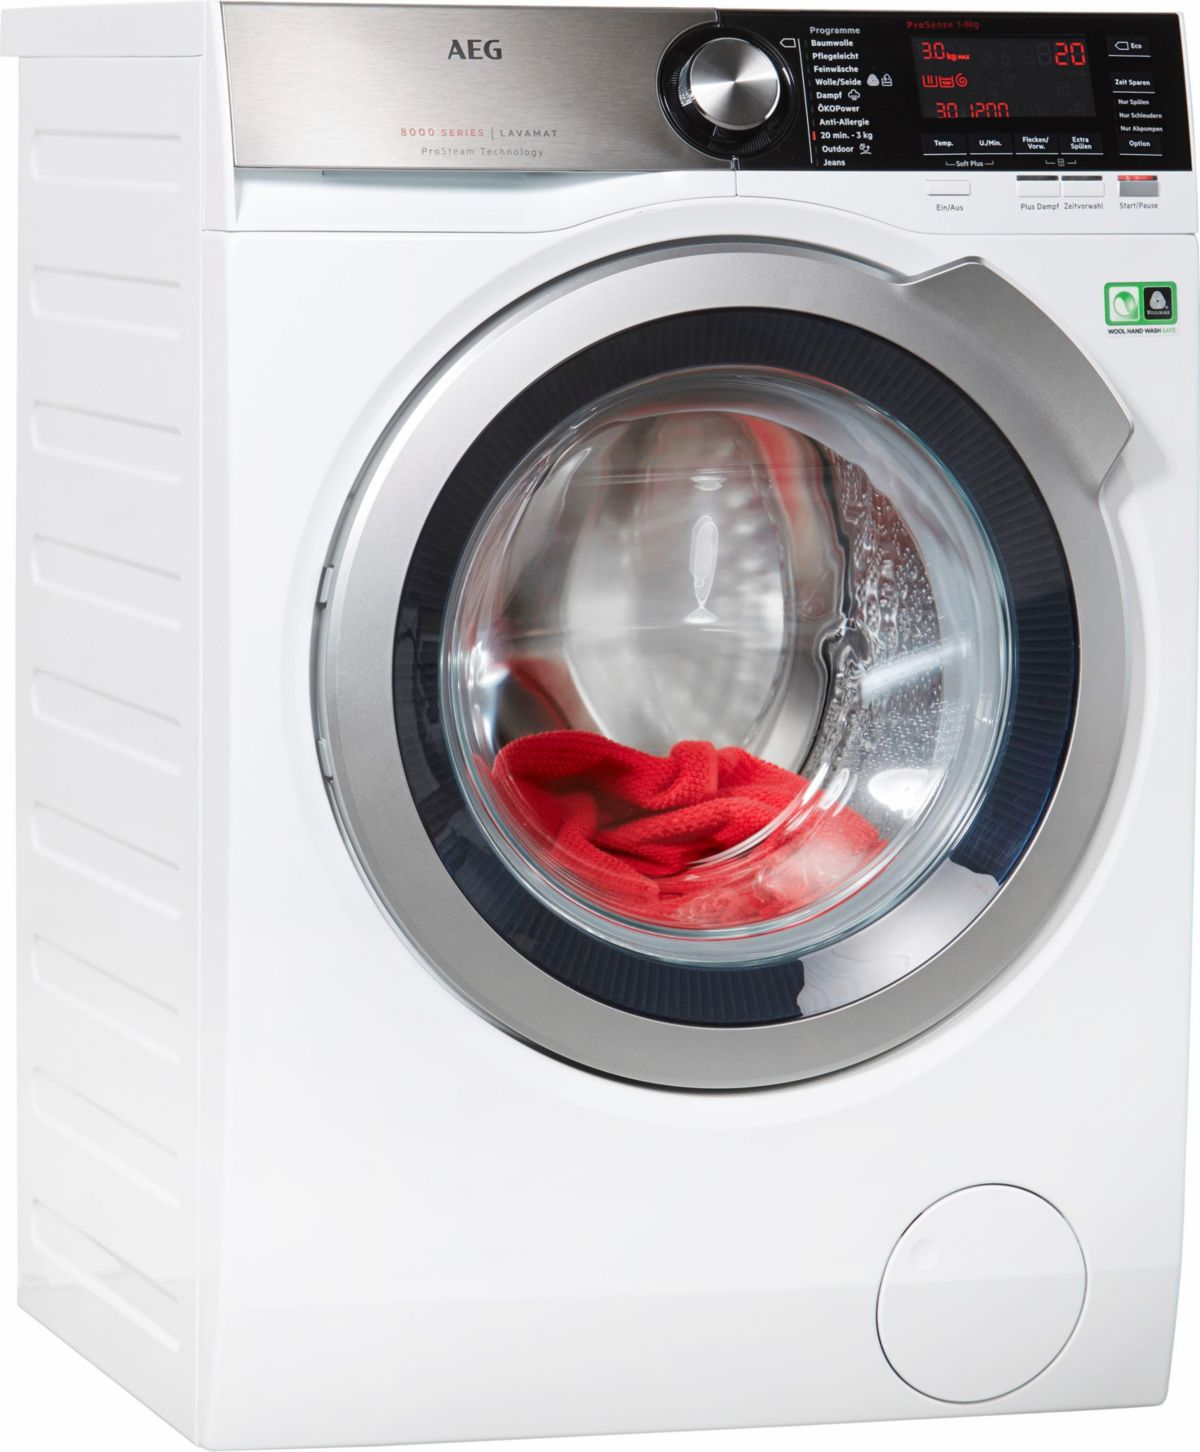 AEG Waschmaschine 8000 LJUBILINE6